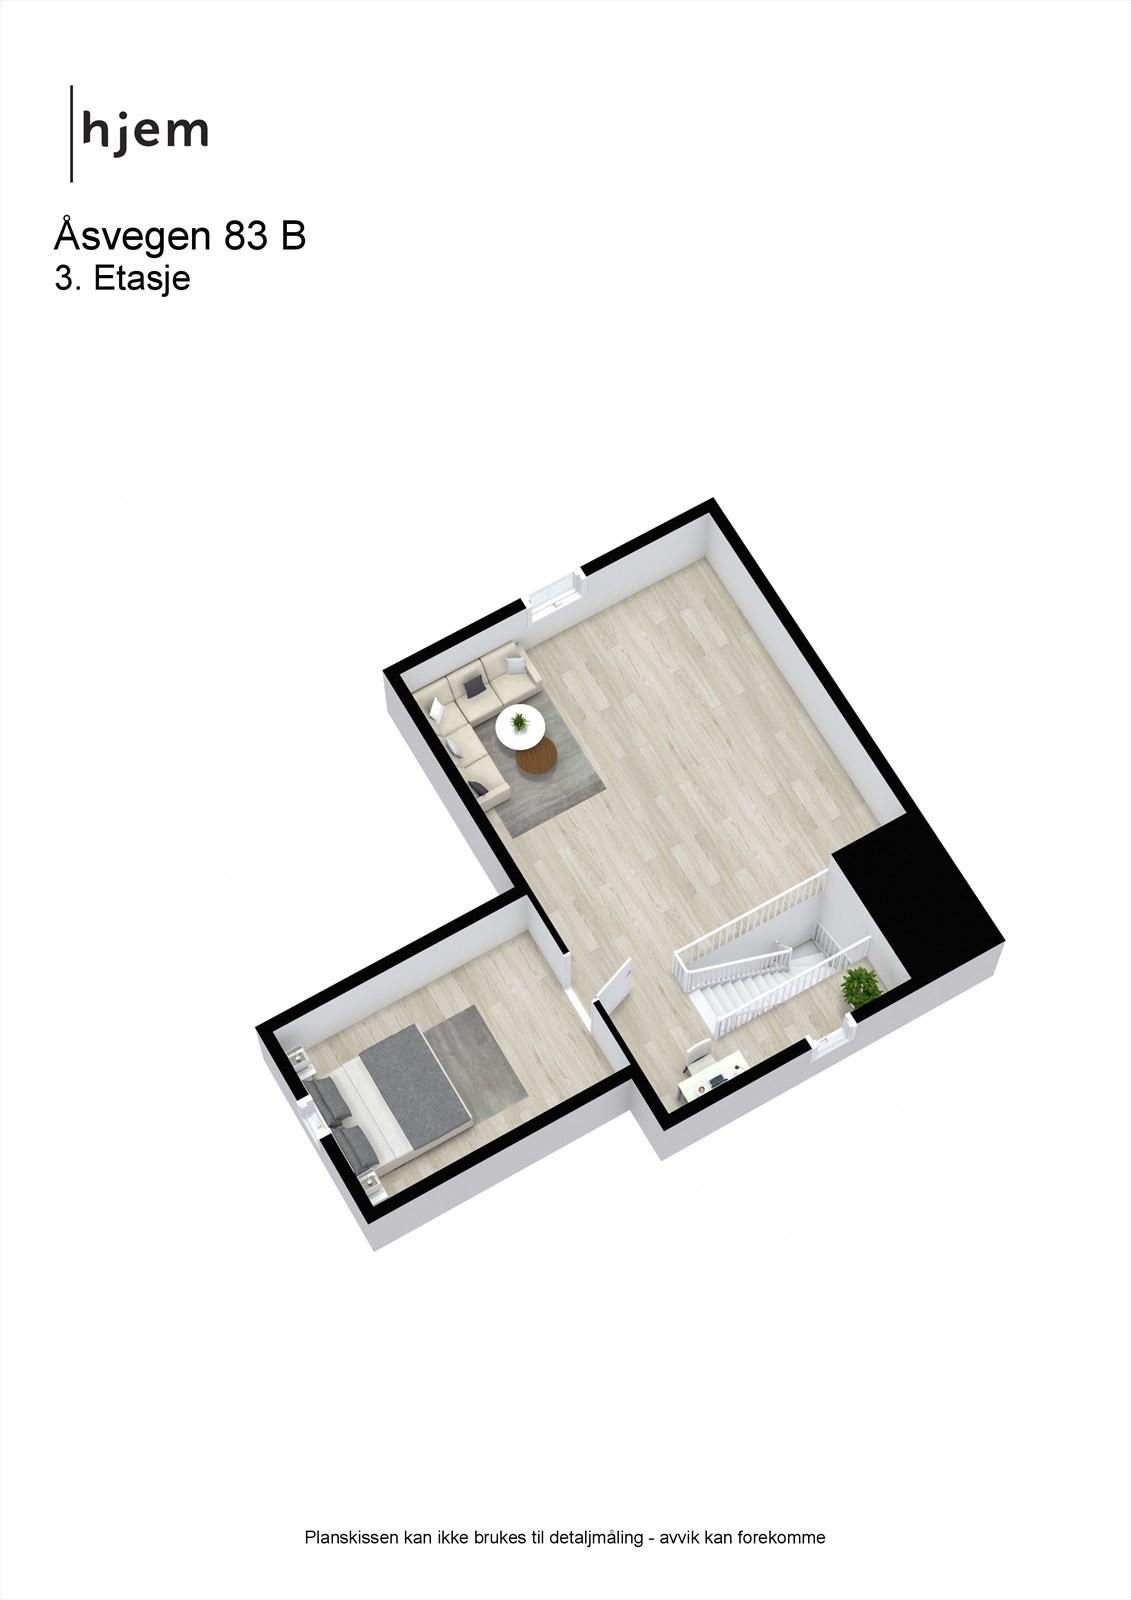 Planløsning 3. etasje.